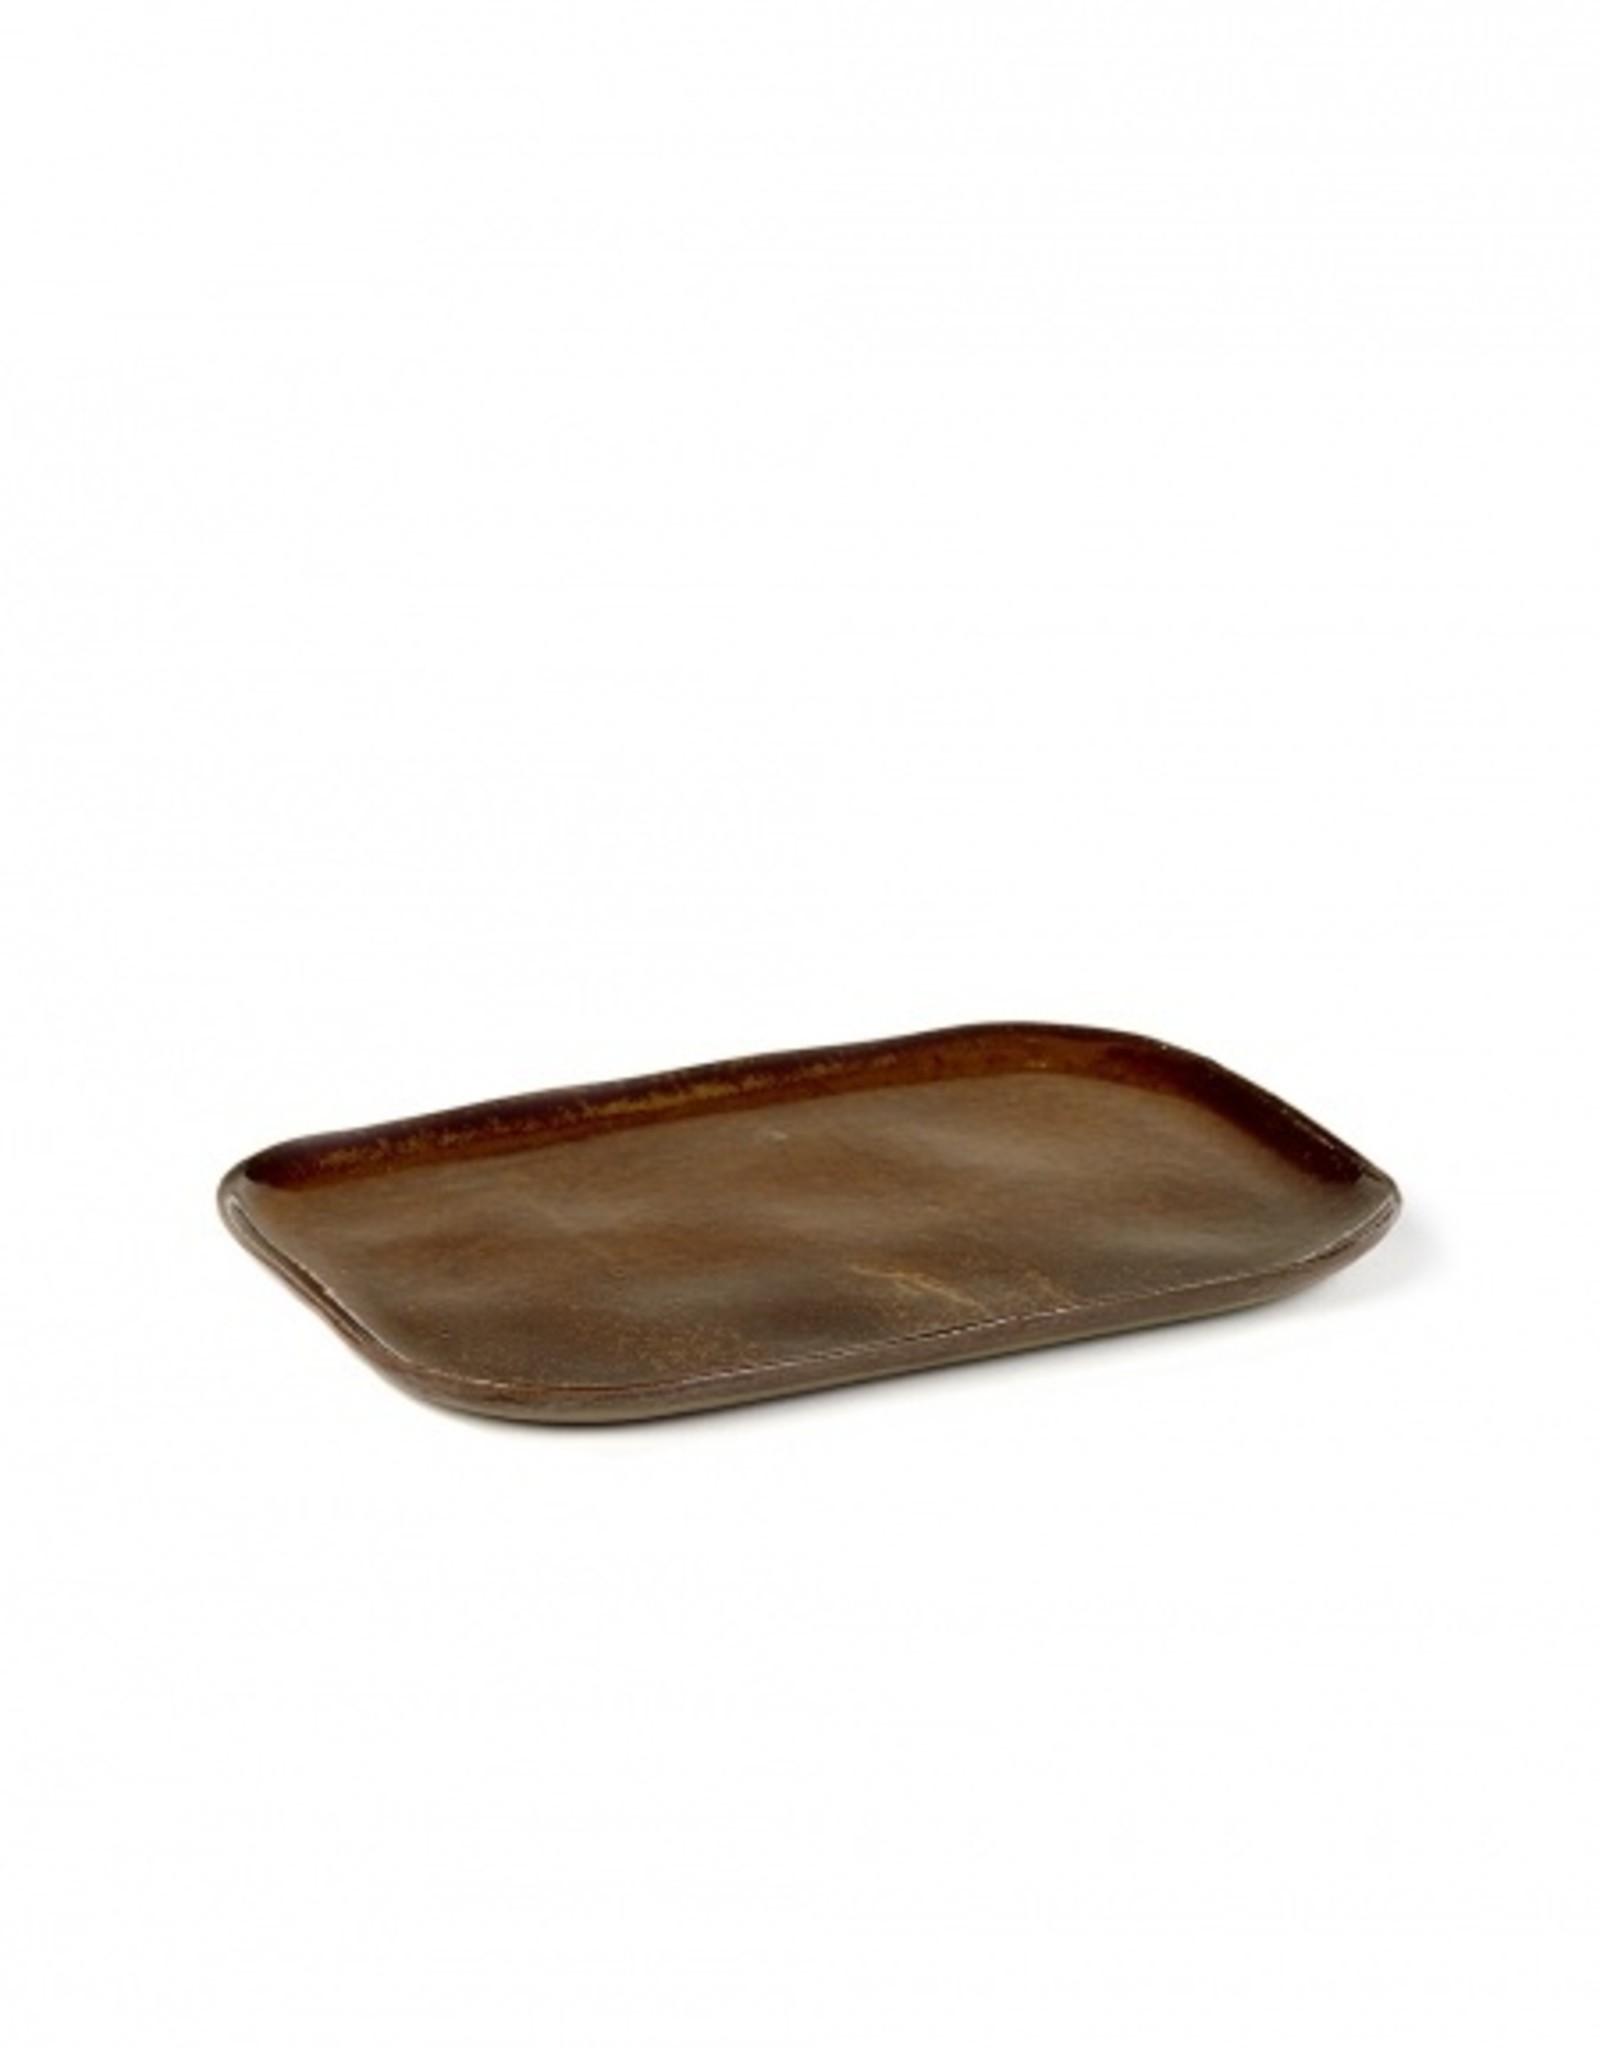 Serax Ocher Sandstone No 2 Rectangular Plate